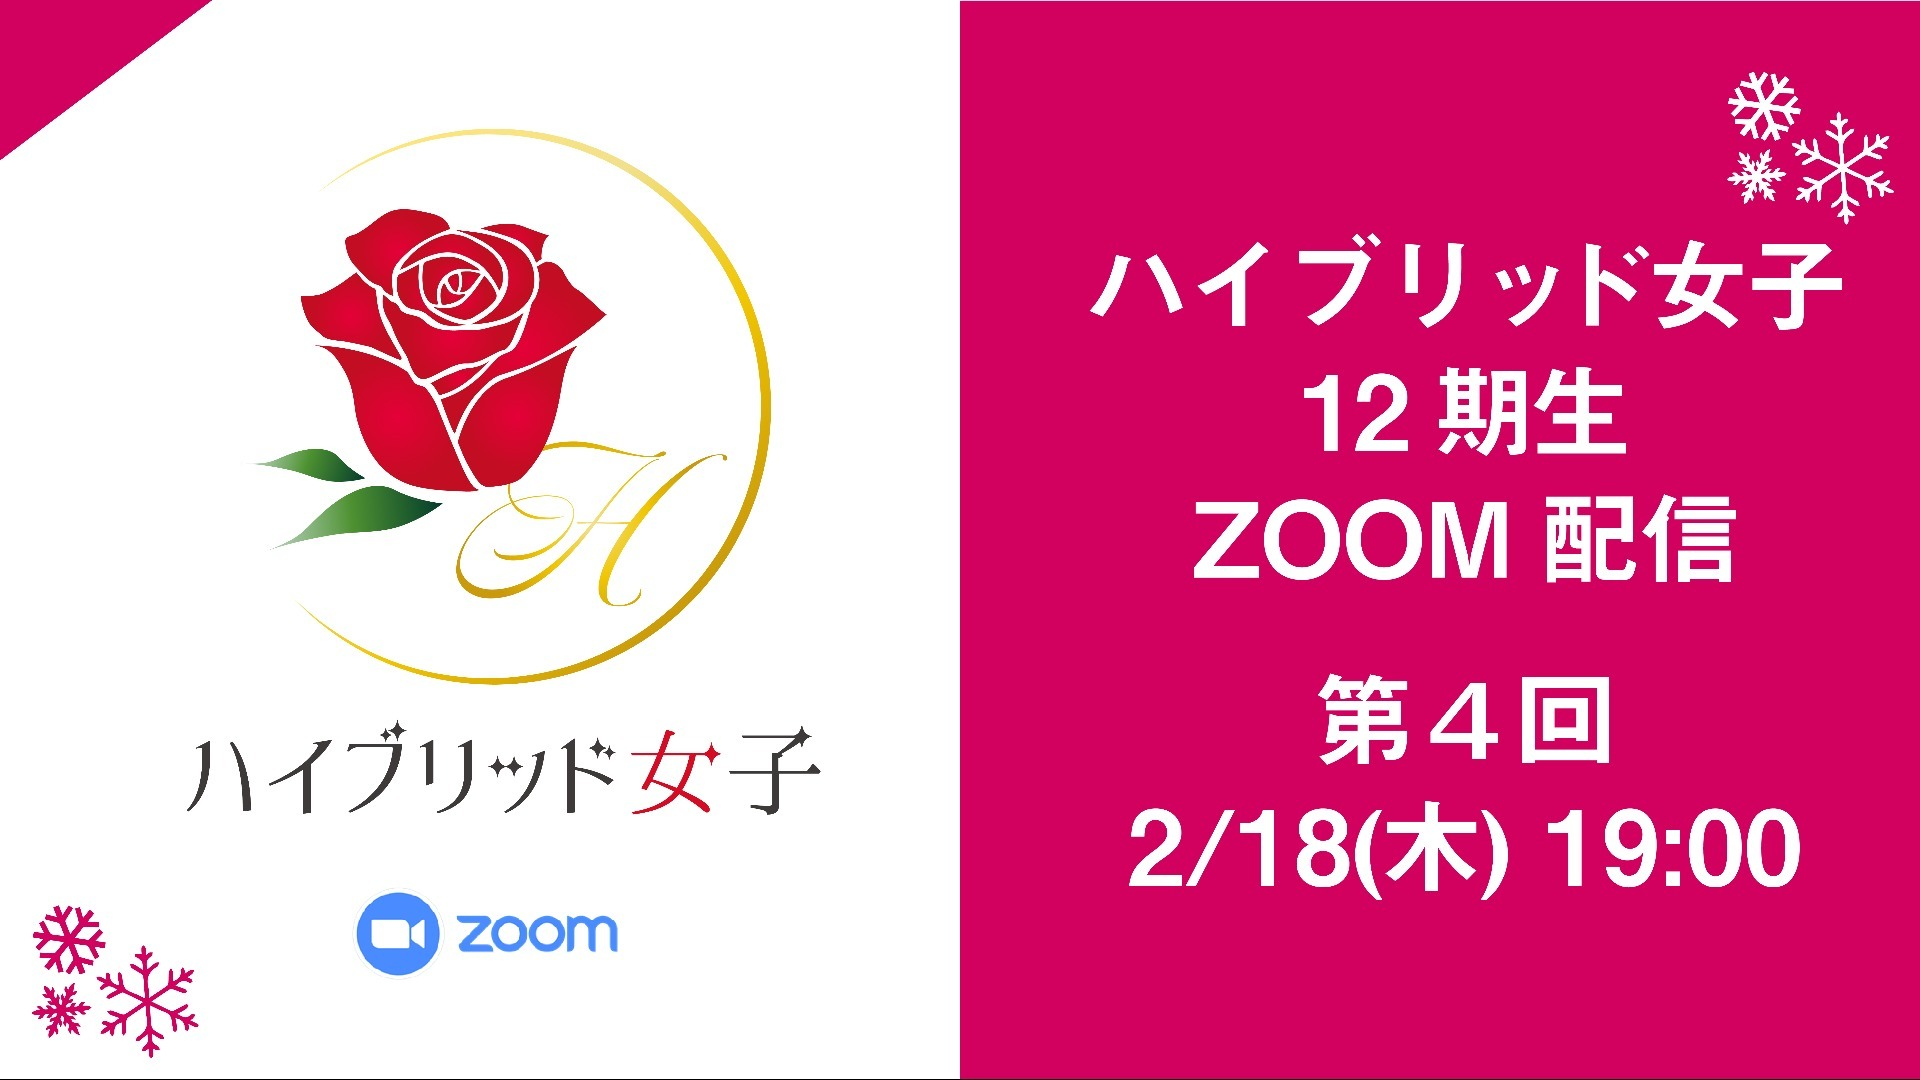 【LIVE】2/18(木)・12期生✨第4回目